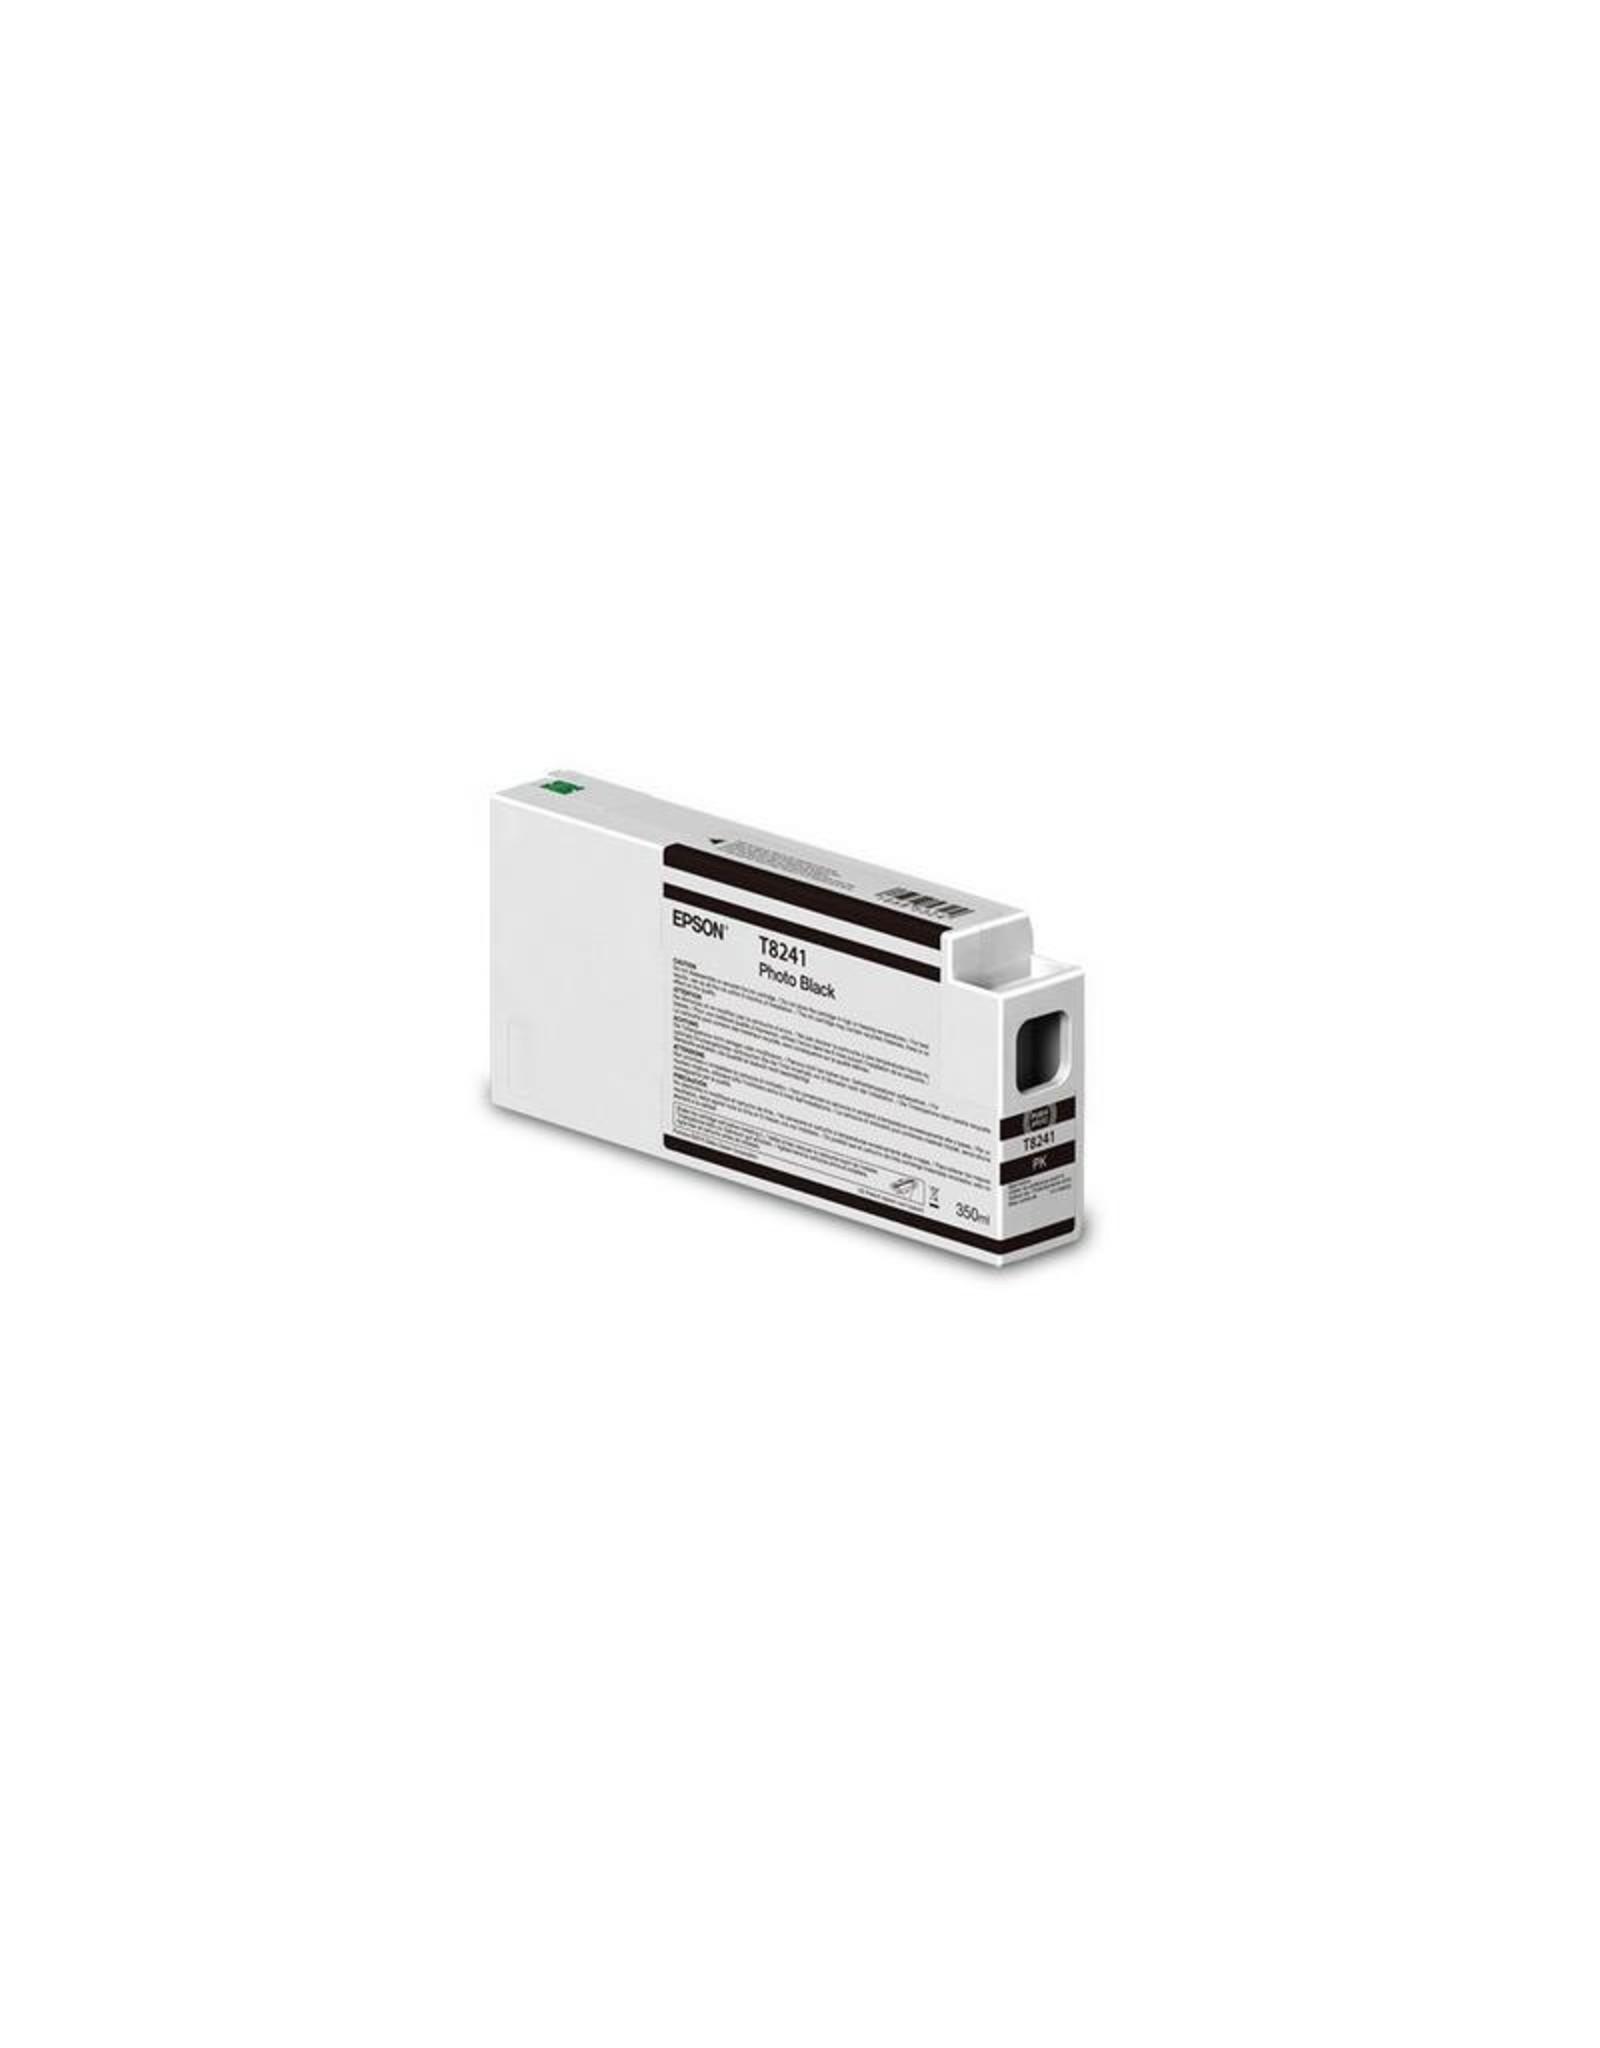 Epson Epson T824100 Ultrachrome HD Photo BLK Ink 350ML